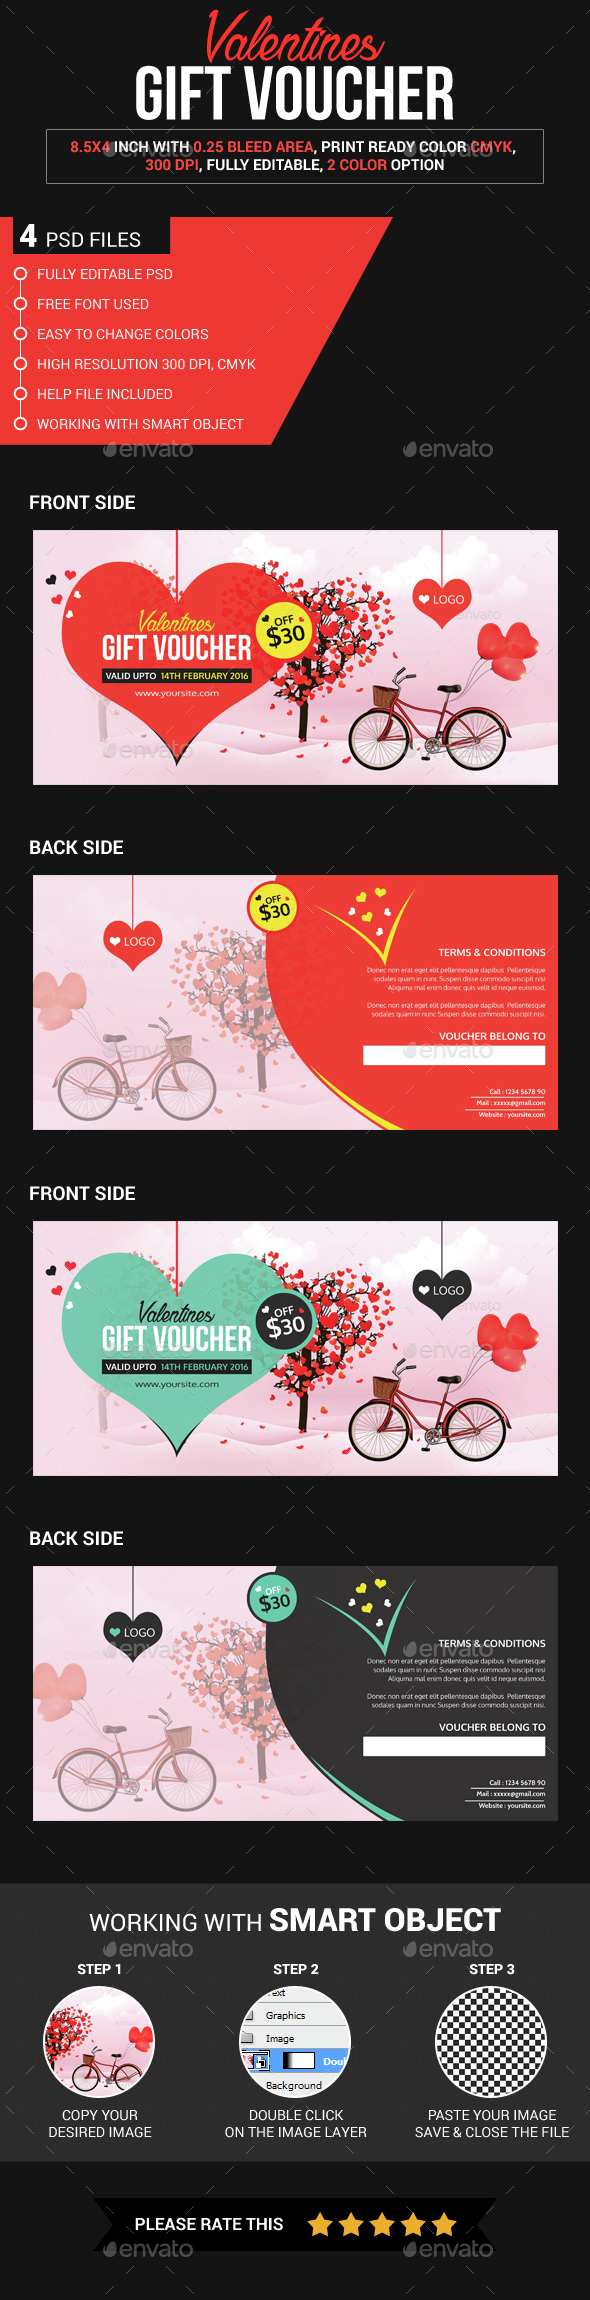 Valentine Gift Voucher - Loyalty Cards Cards & Invites